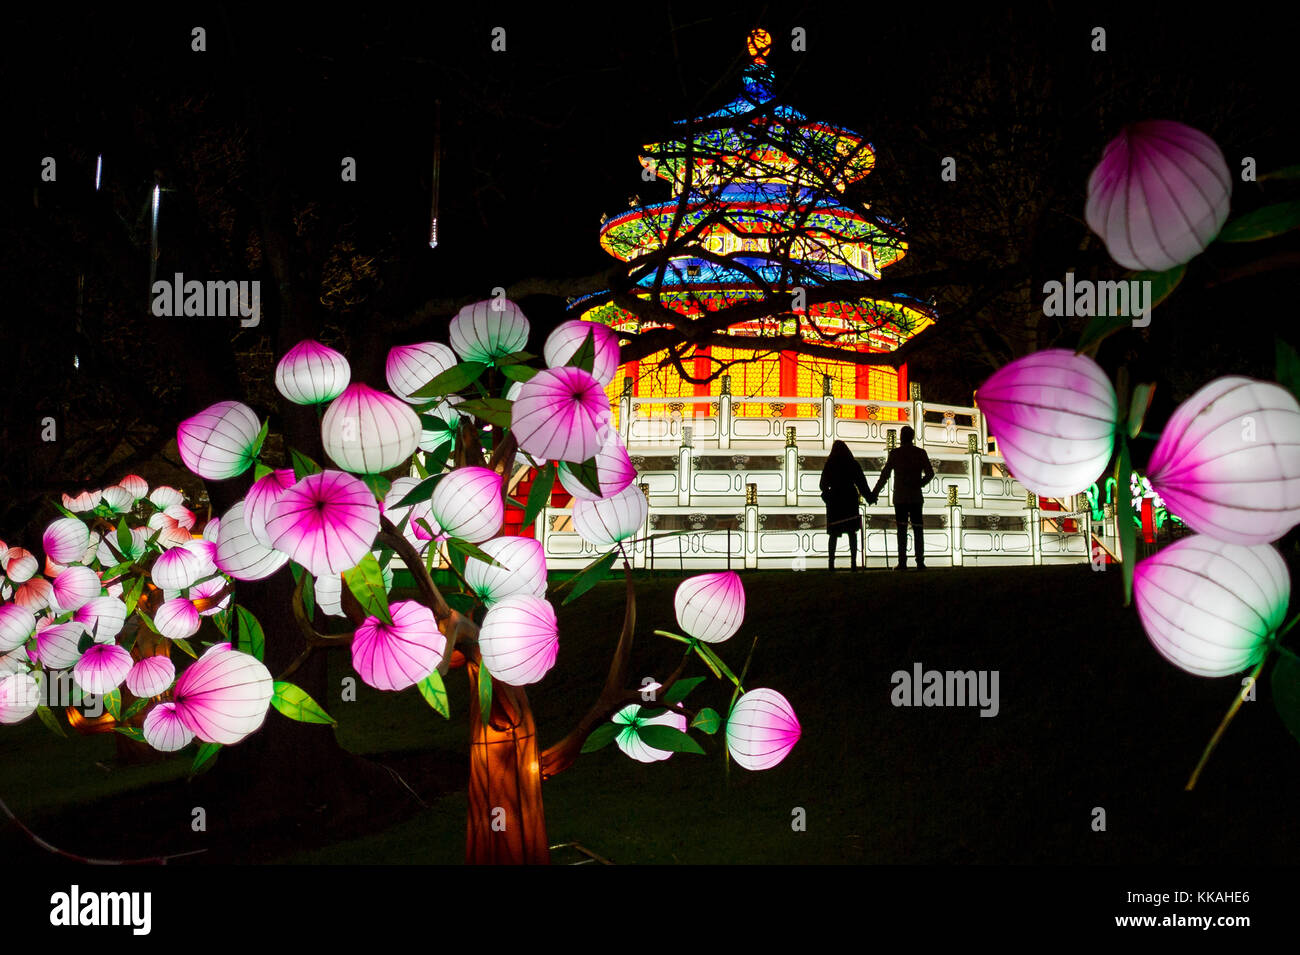 Edinburgh, UK. 29th Nov, 2017. Edinburgh UK Nov 29 2017; RZSS Edinburgh Zoo switches on over 450 colossal, lanterns - Stock Image